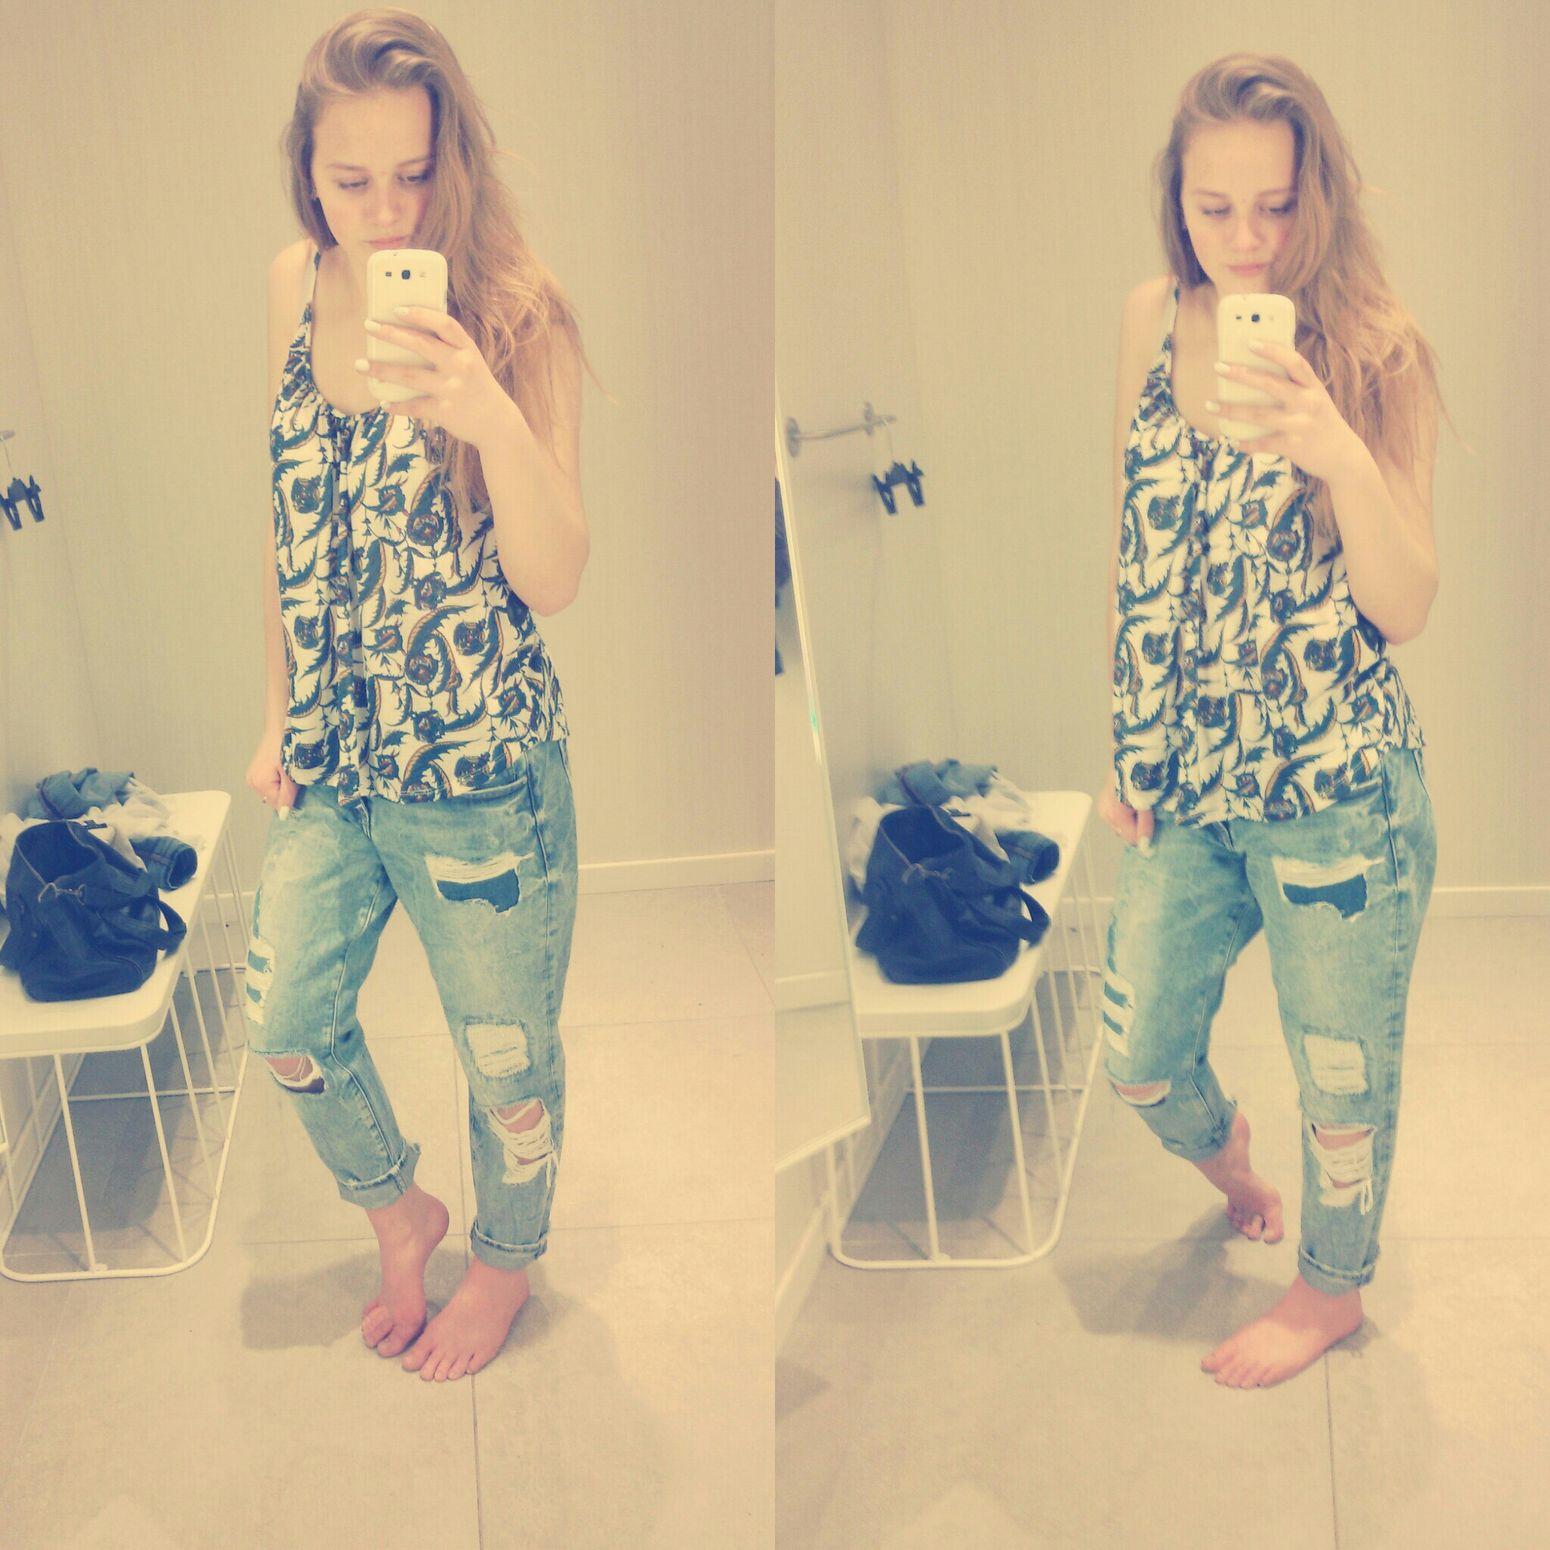 H&M♥ Street Fasion H&m Jeans Blonde ♡ Samsung White Perfect Follow Me On Instagram That's Me Girl Egle Krusinakaite 💙